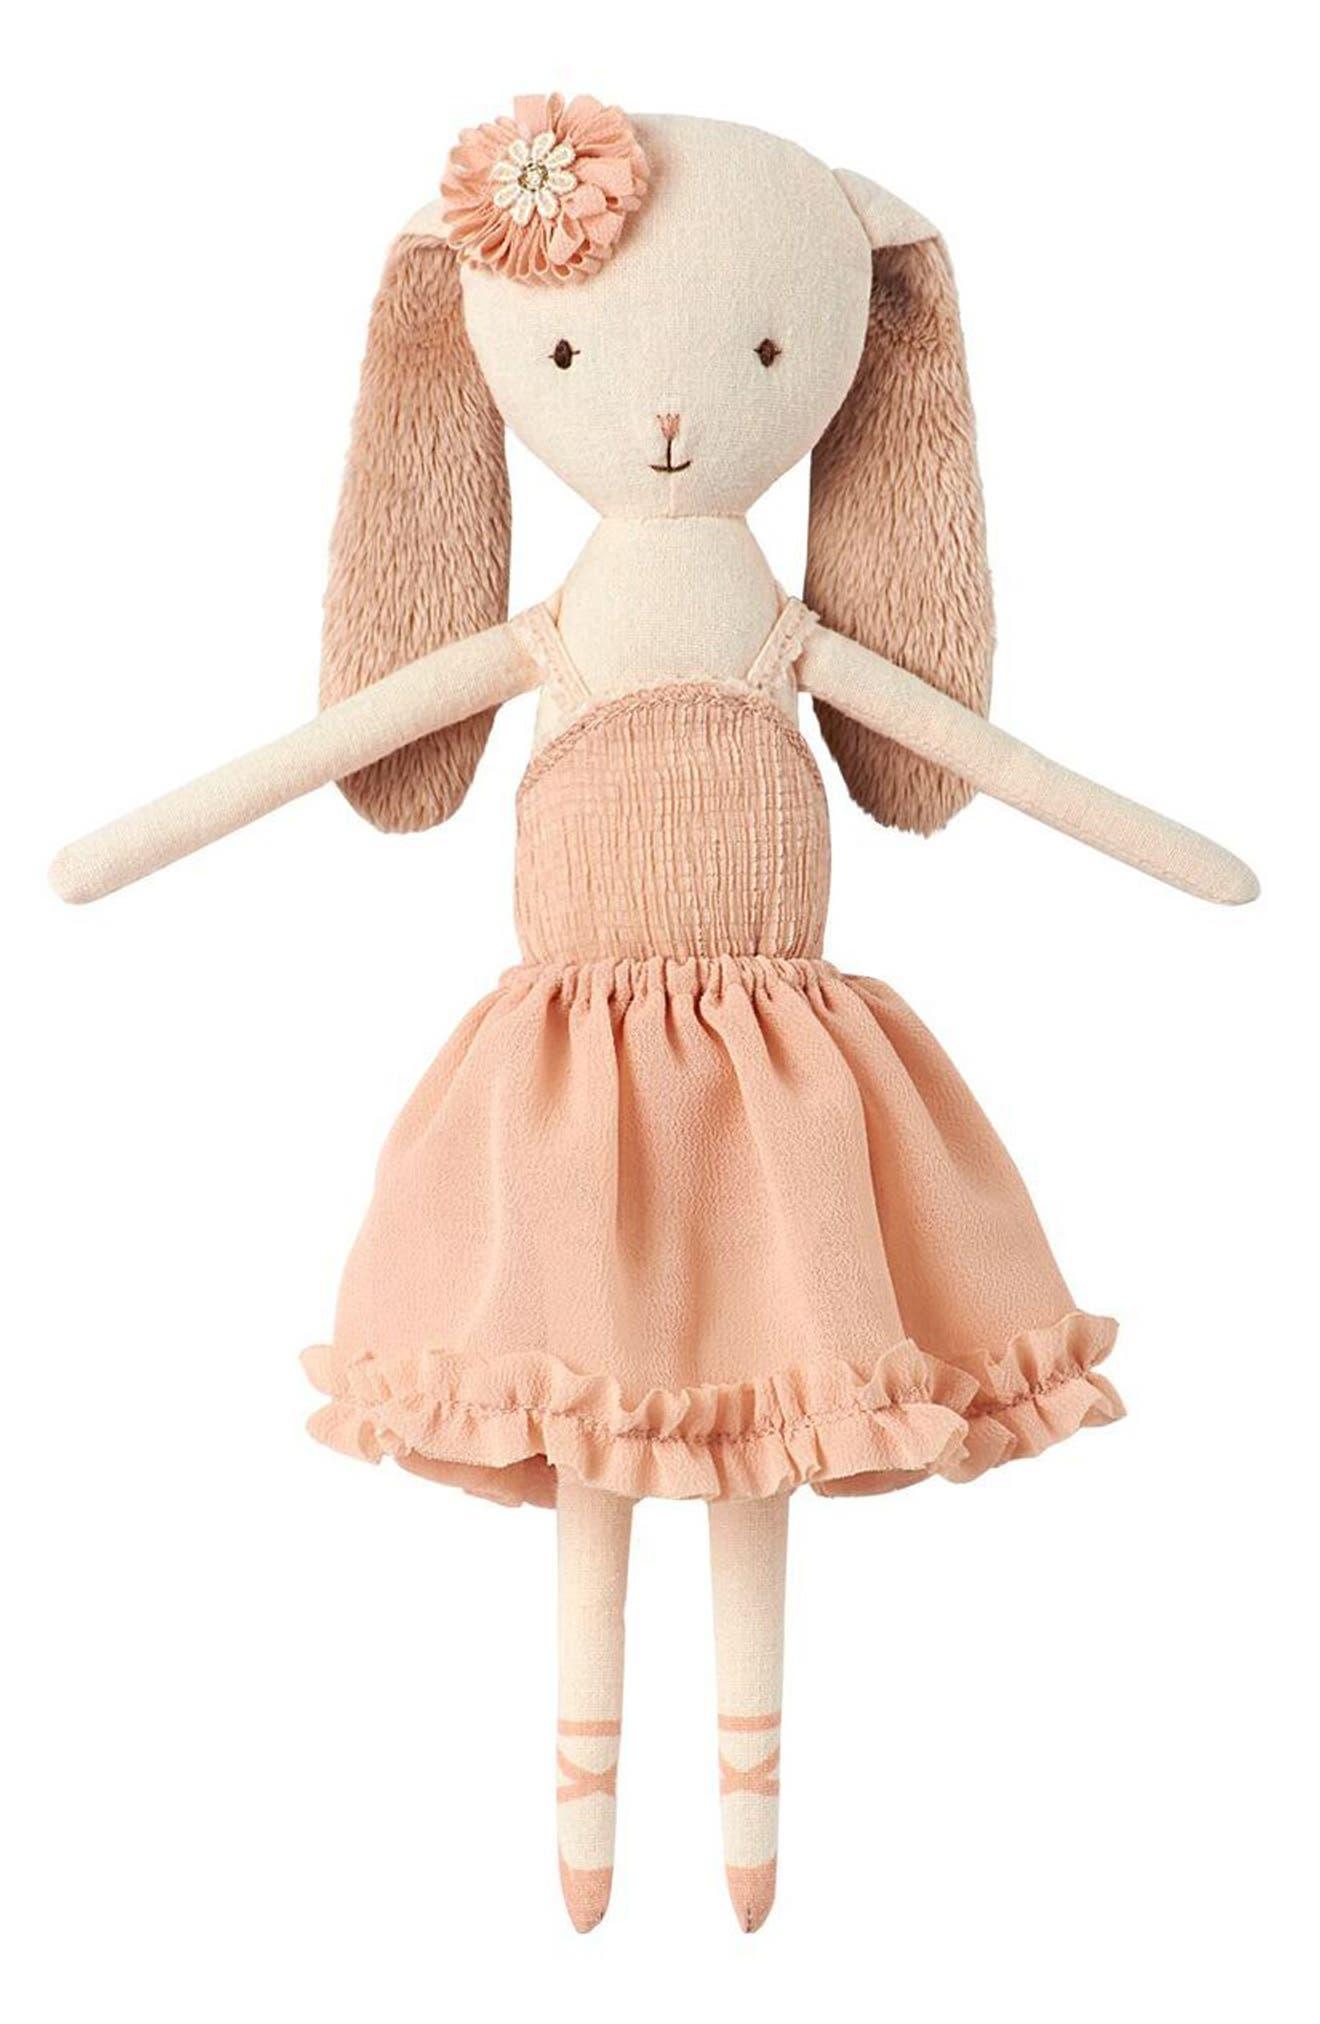 Dancing Bunny Stuffed Animal,                         Main,                         color, Multi